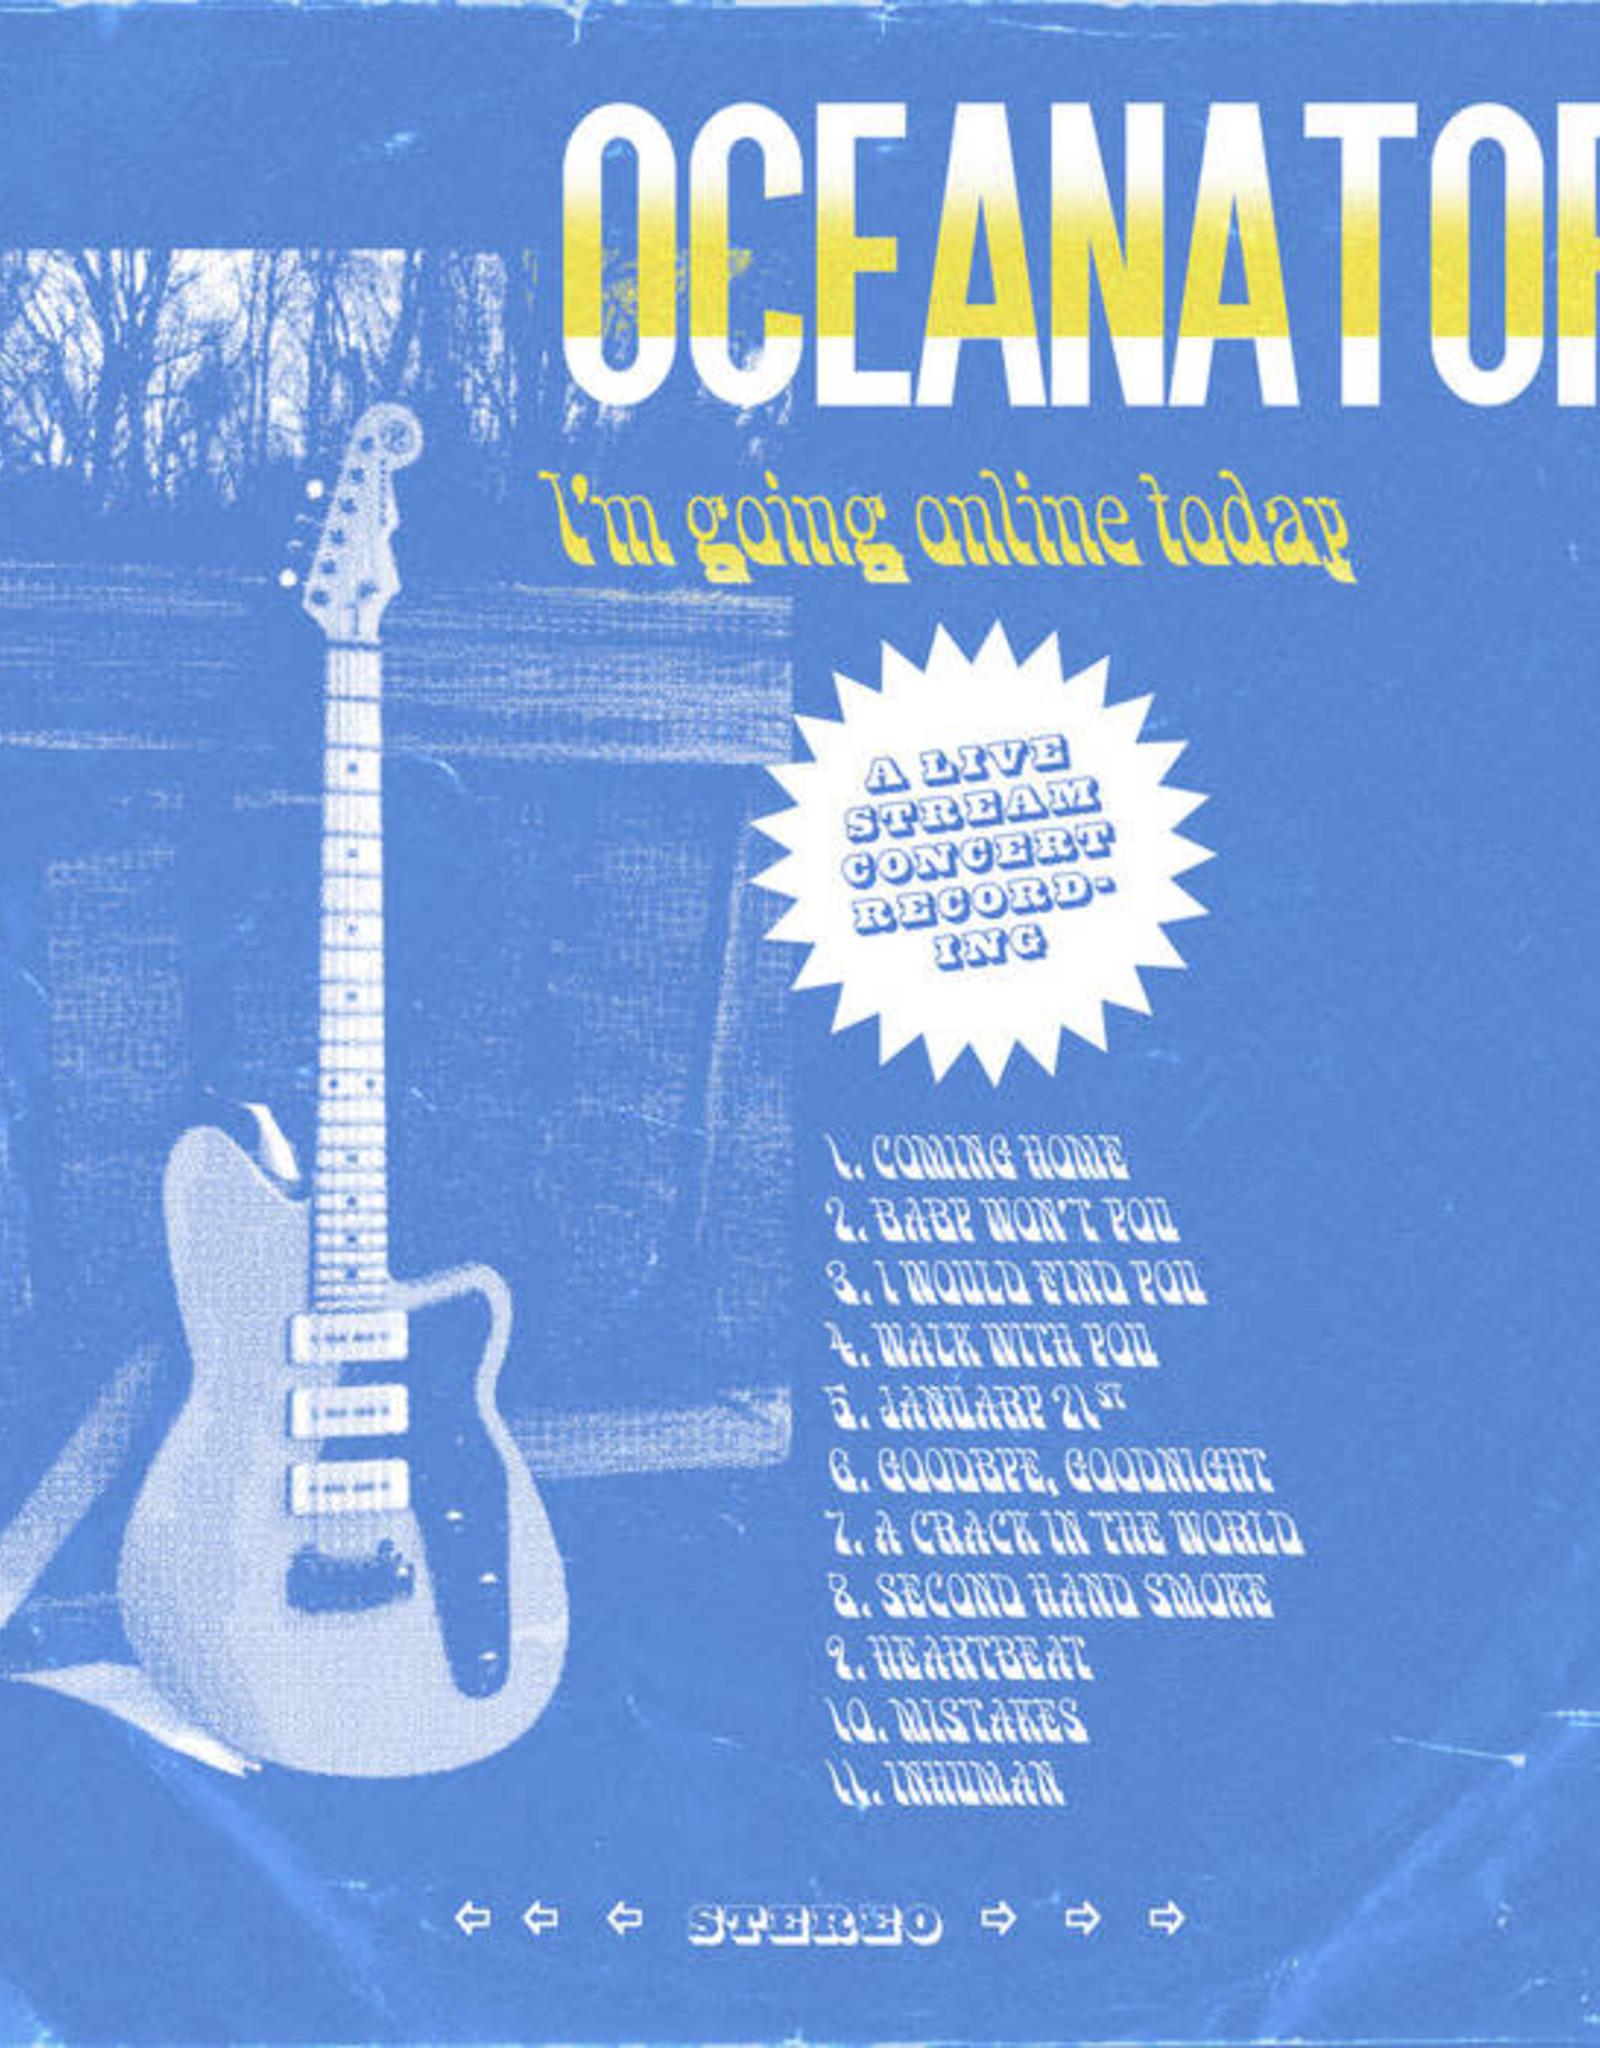 Oceanator - I'm Going Online Today: A Livestream Concert Recording